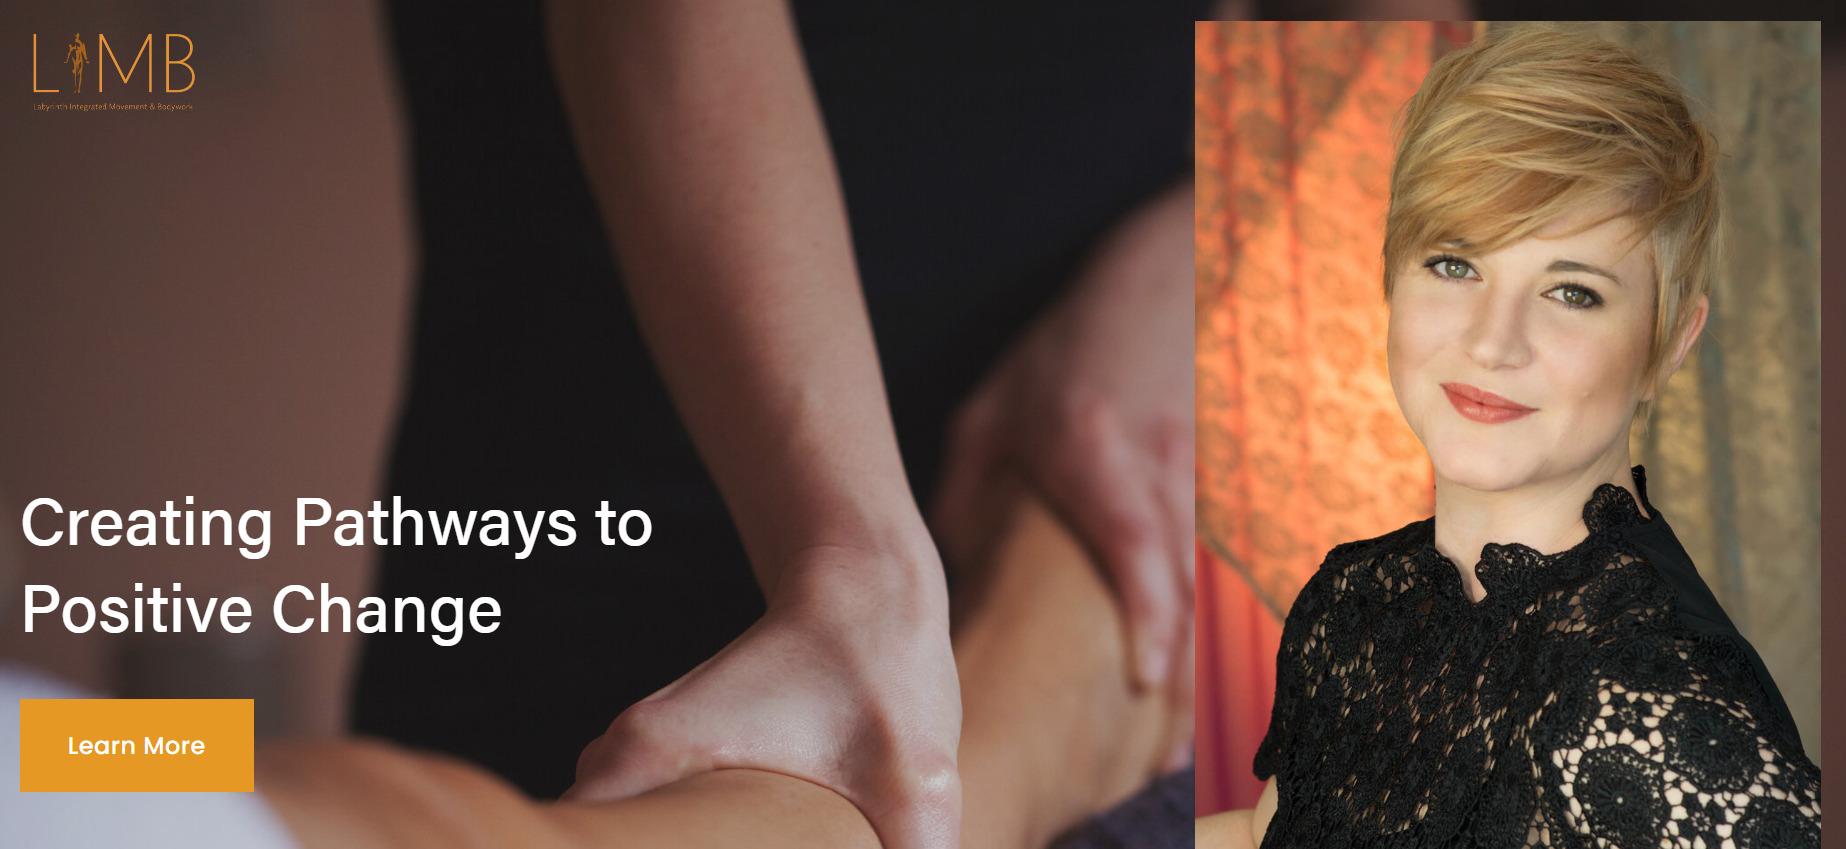 elise massage pics coverpage